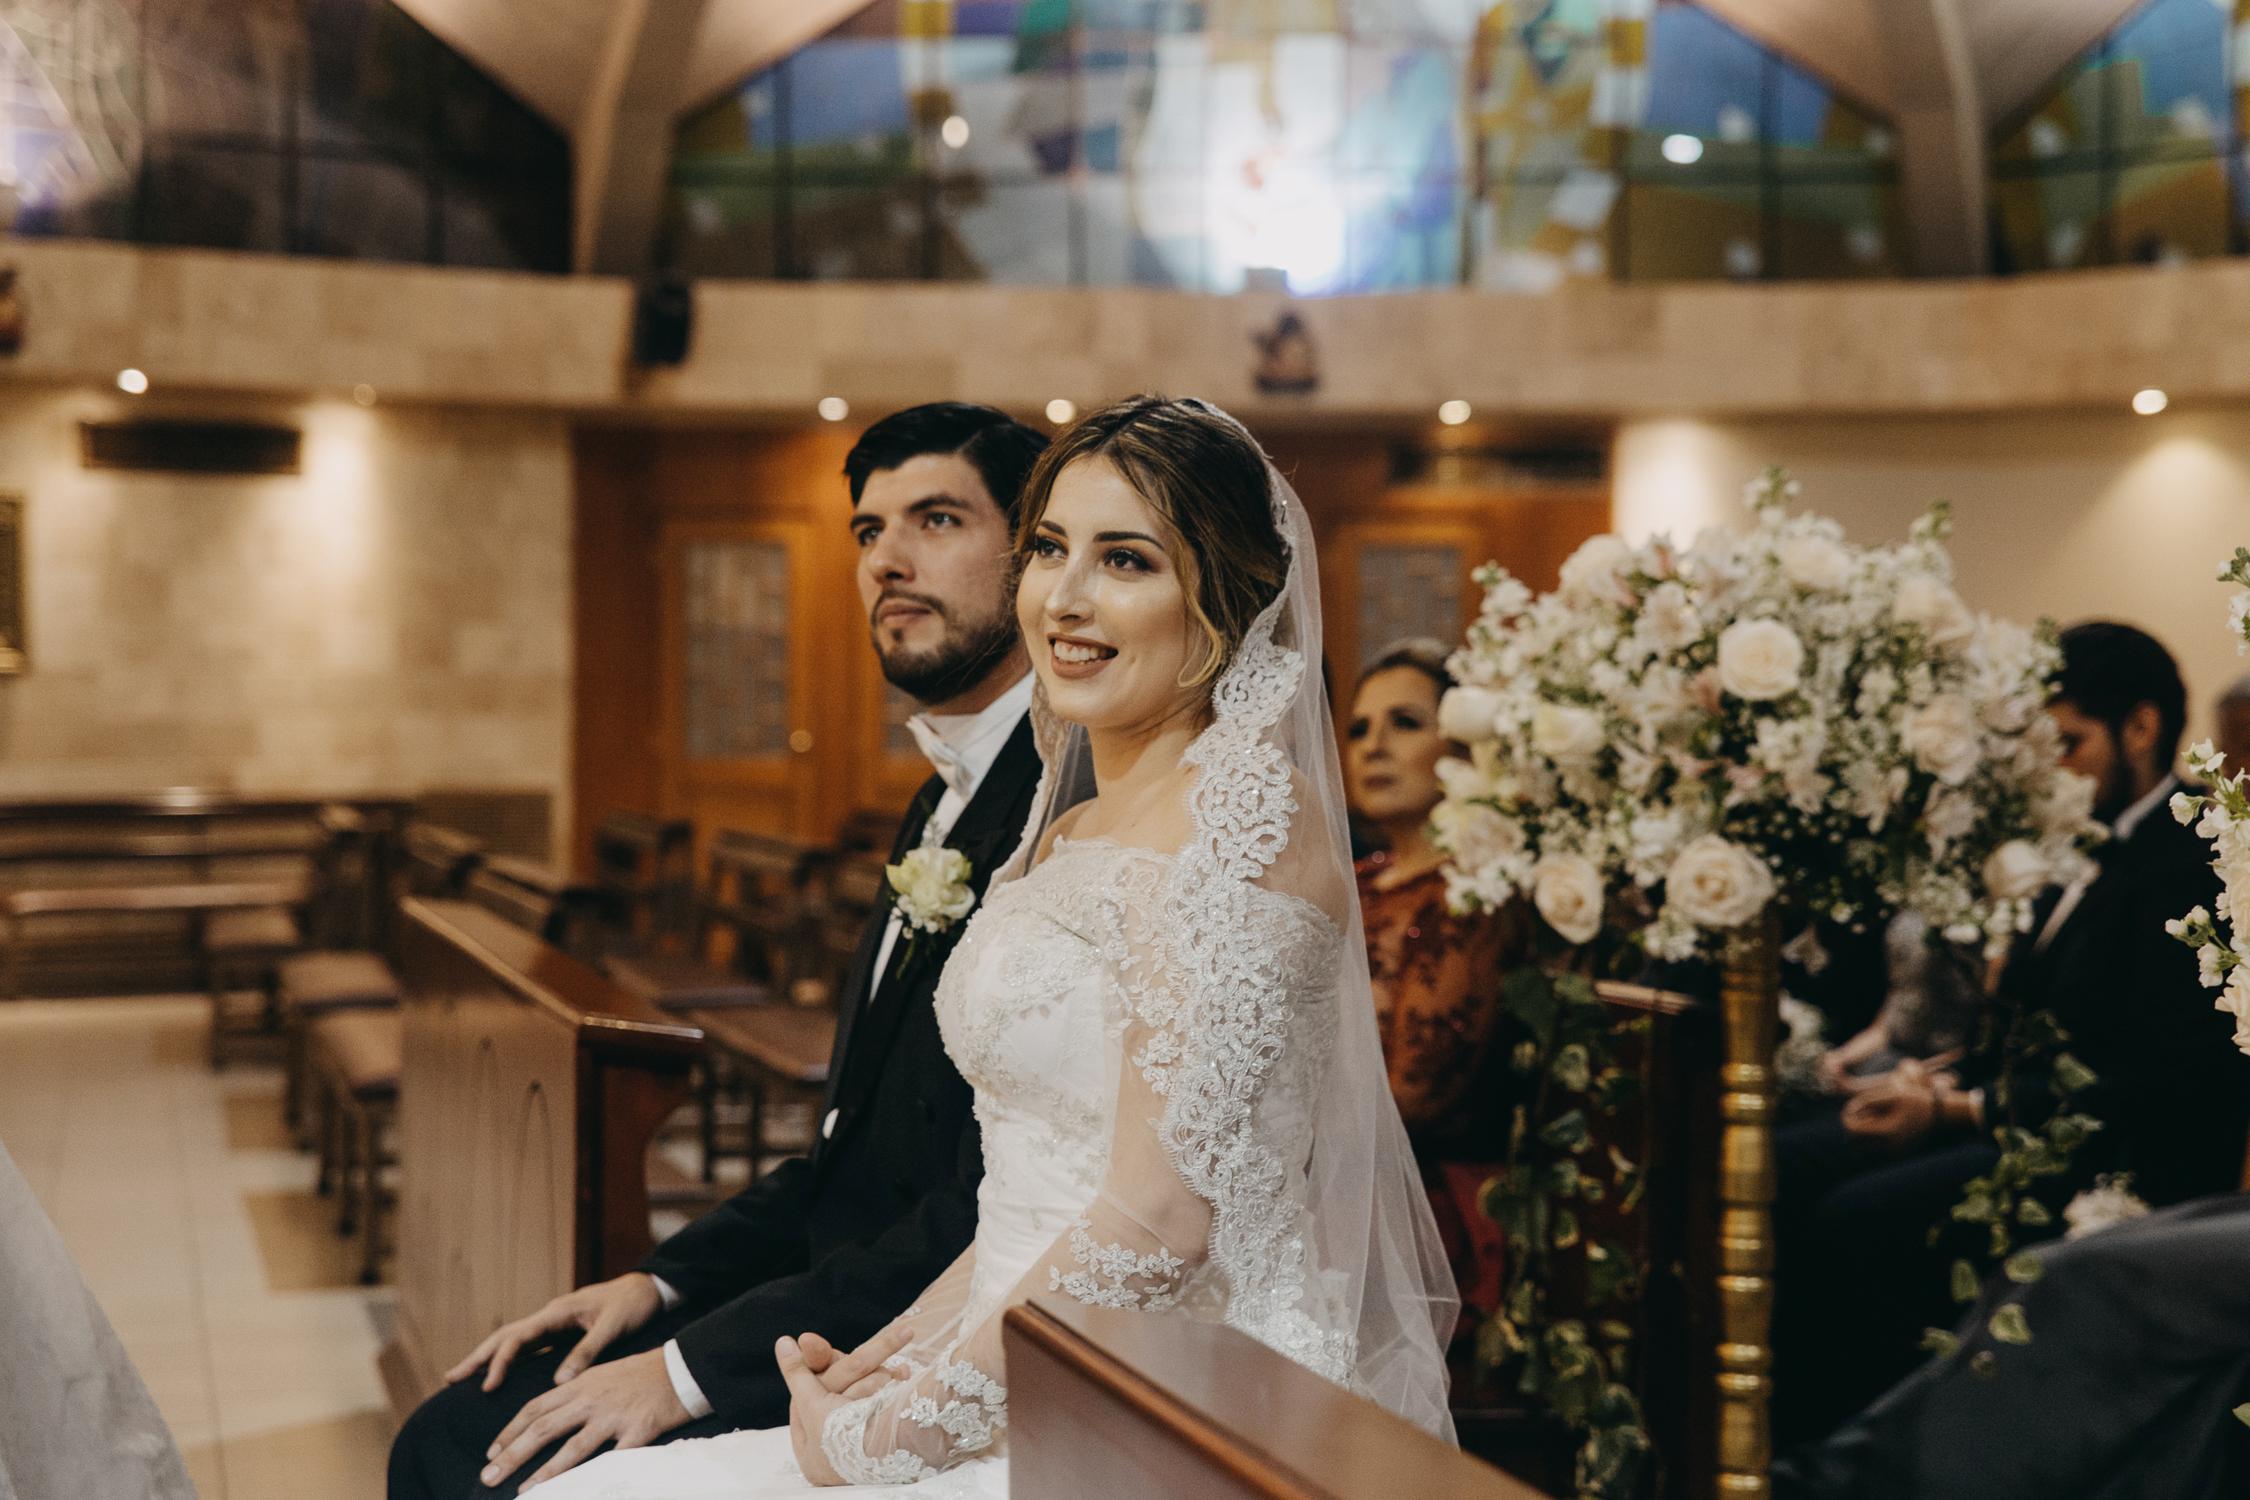 Michelle-Agurto-Fotografia-Bodas-Ecuador-Destination-Wedding-Photographer-Vicky-Javier-65.JPG